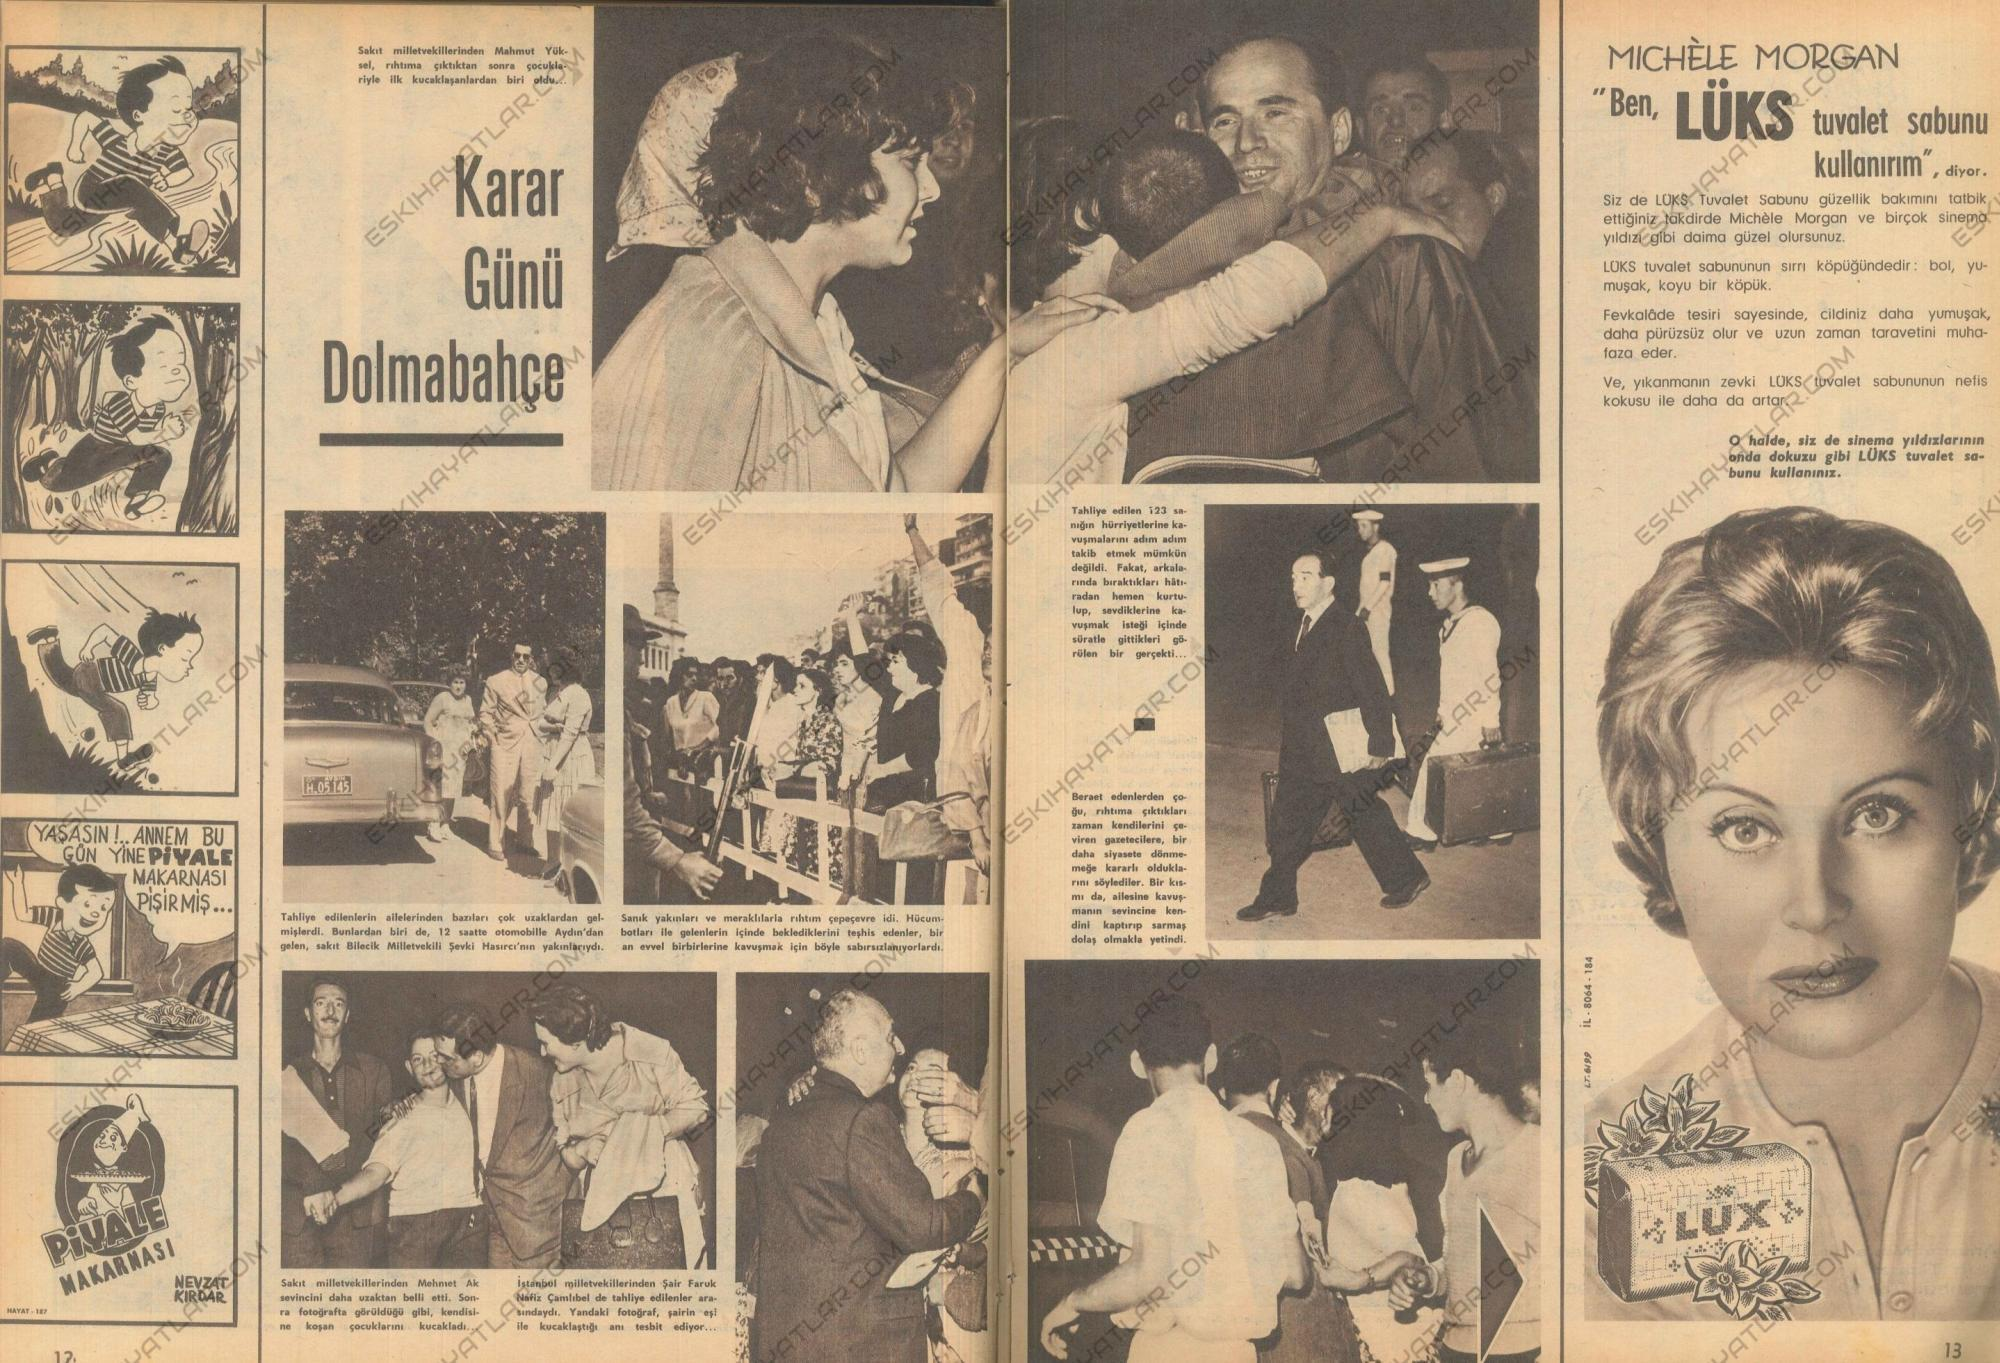 1960-ihtilali-idam-edilenler-adnan-menderes-hasan-polatkan-fatin-rustu-zorlu-yassiada-tutanaklari-1961-hayat-dergisi-arsivleri (13)